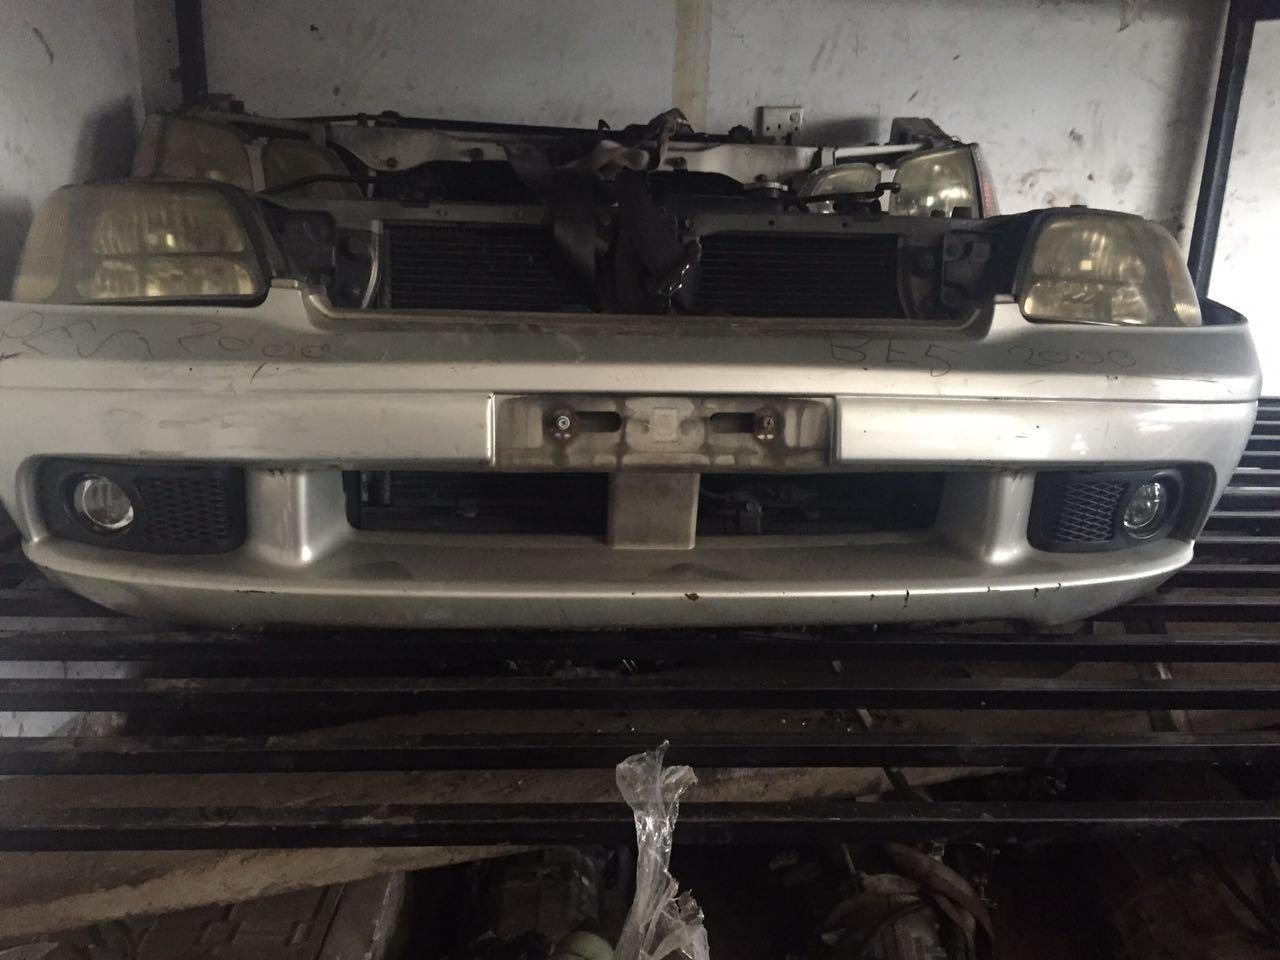 Subaru Legacy BL5,Nosecut. 00158